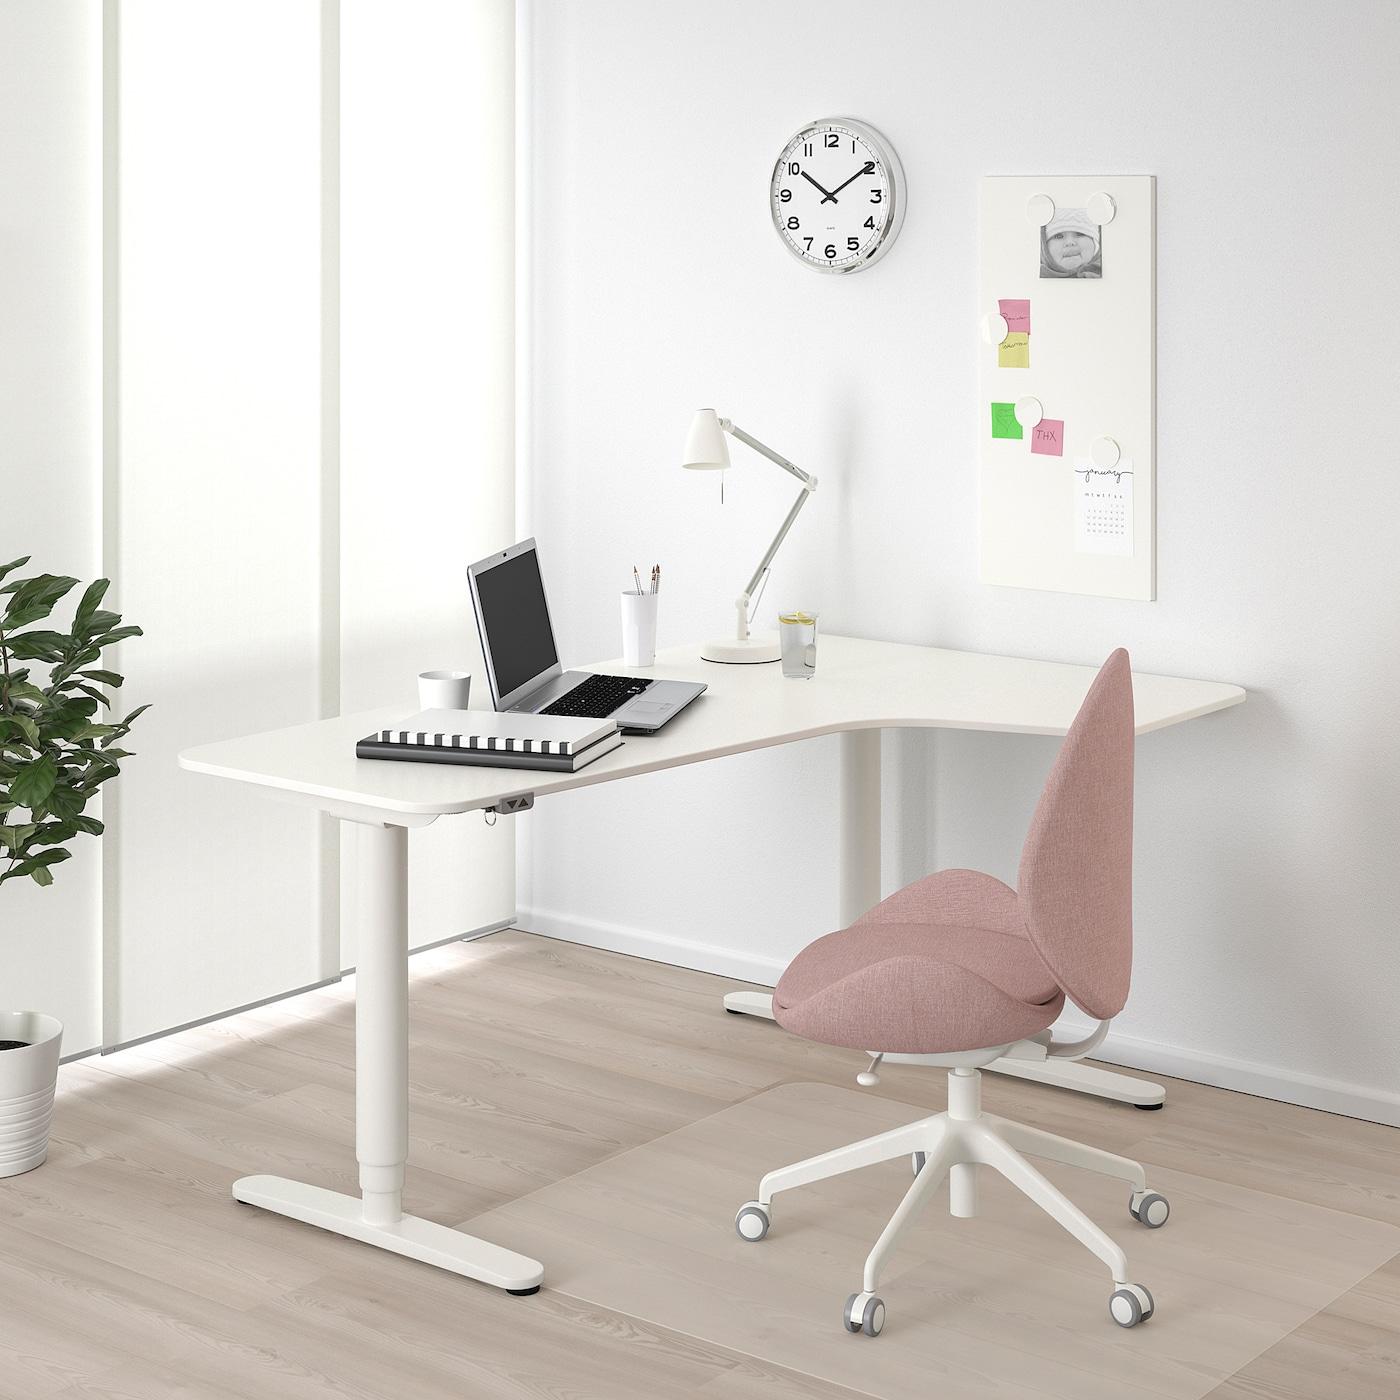 "BEKANT corner desk right sit/stand white 63 "" 43 1/4 "" 22 "" 48 "" 154 lb"